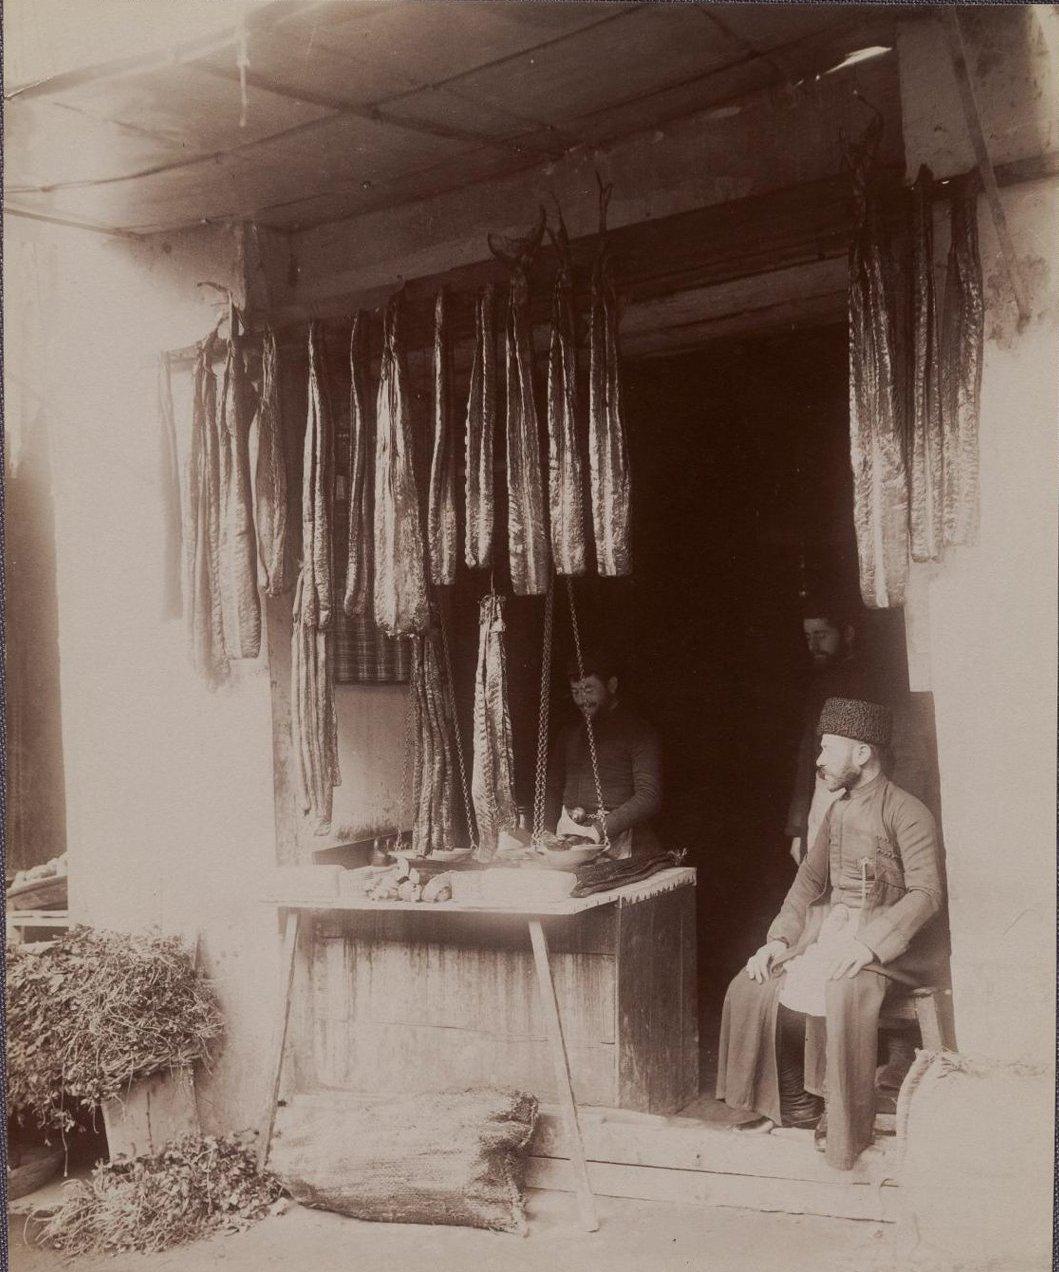 Рыбная лавка, где продают тешку. 1890-е